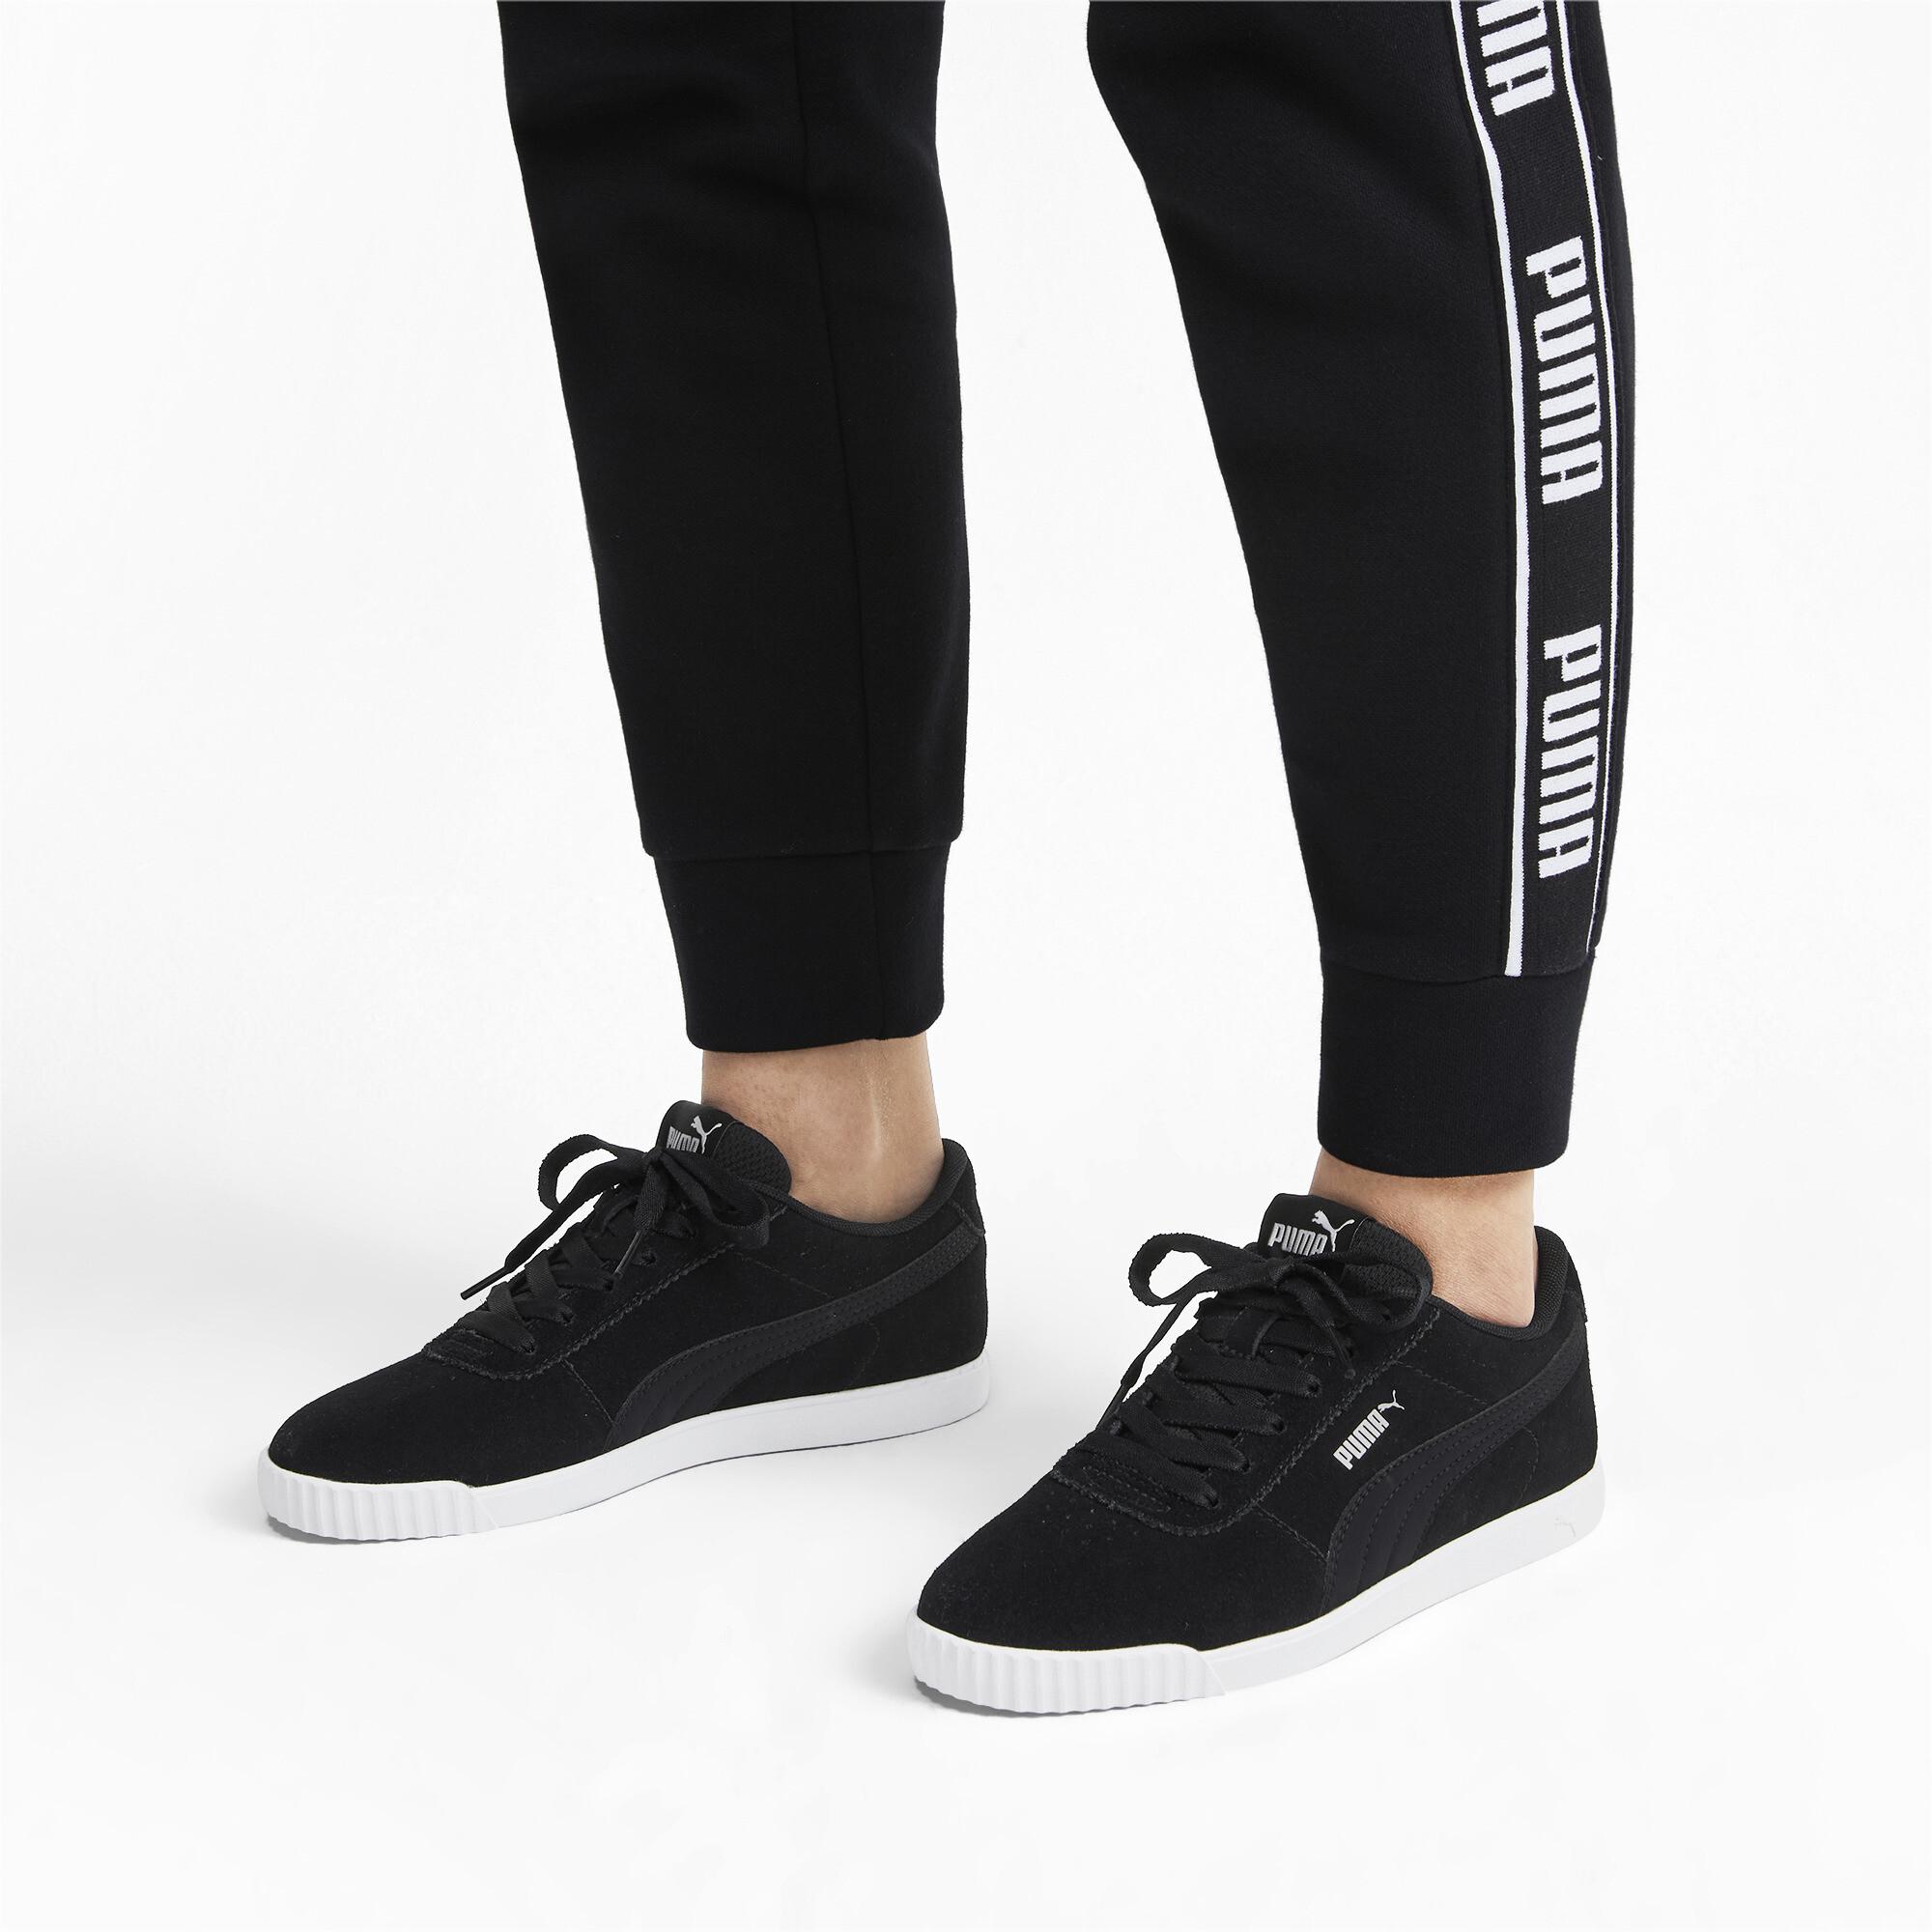 PUMA-Women-039-s-Carina-Slim-Suede-Sneakers thumbnail 19